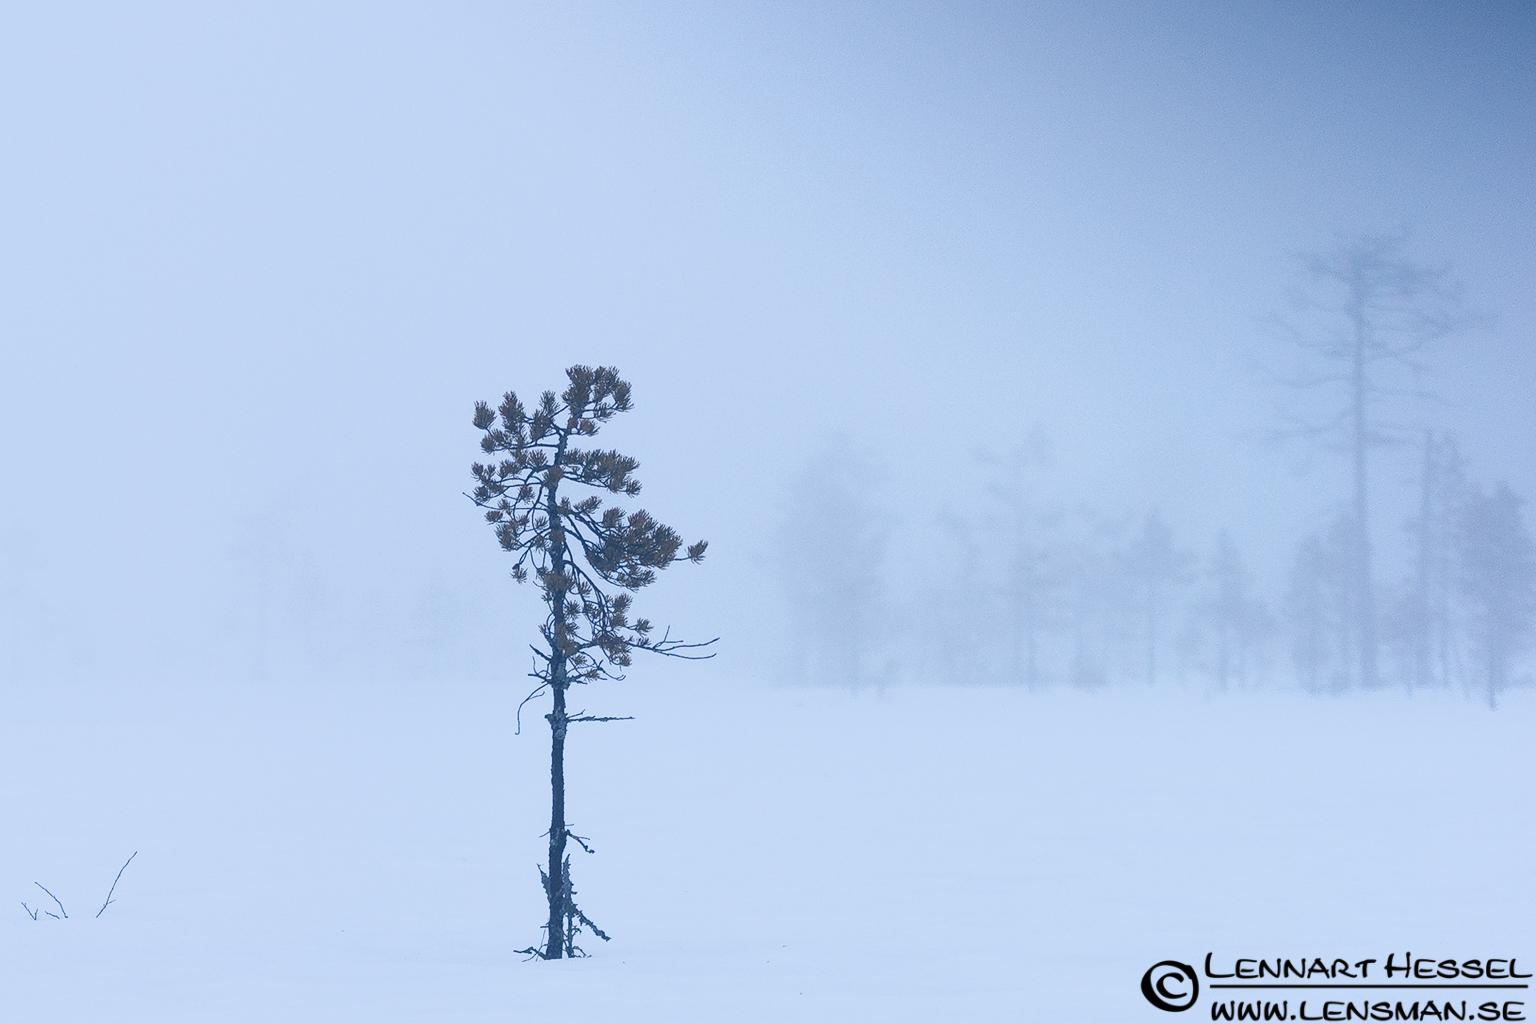 Misty Taiga in Finland